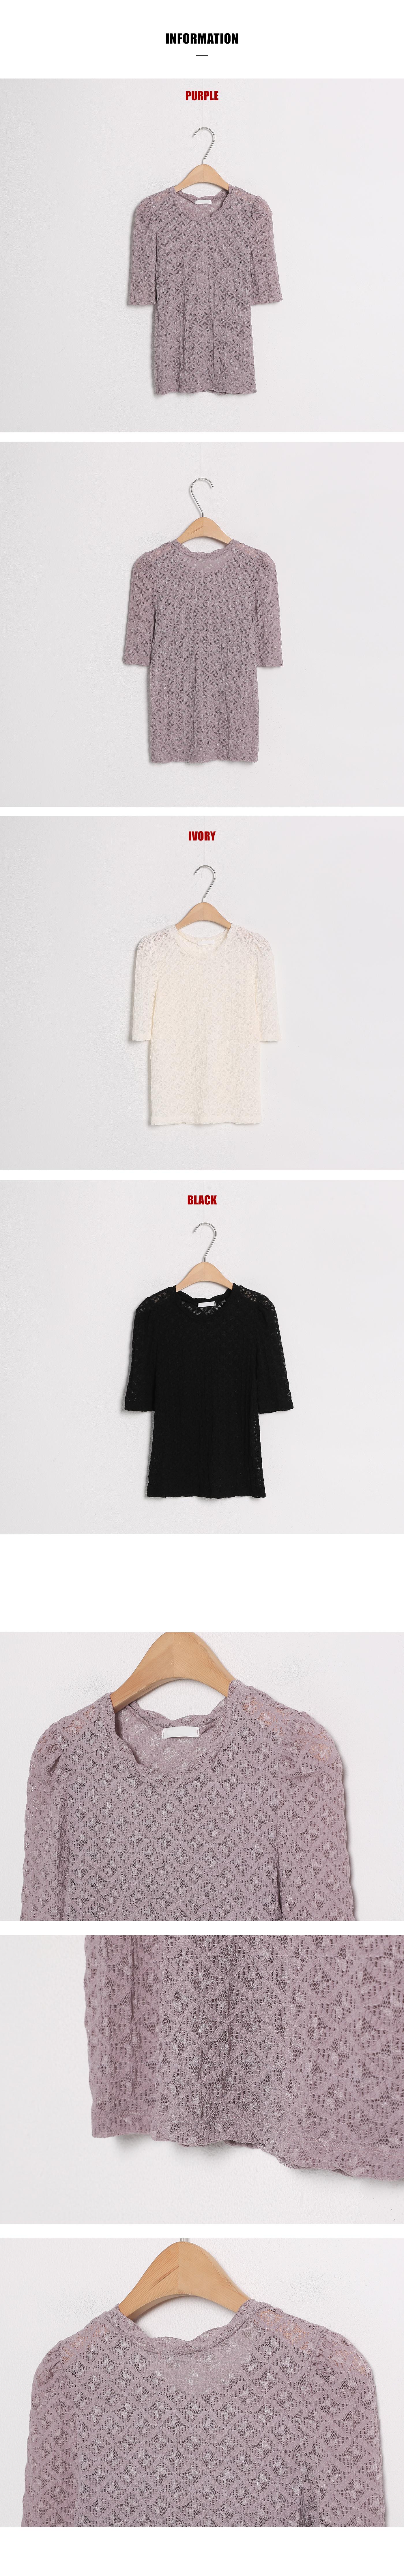 Rooibos t-shirt